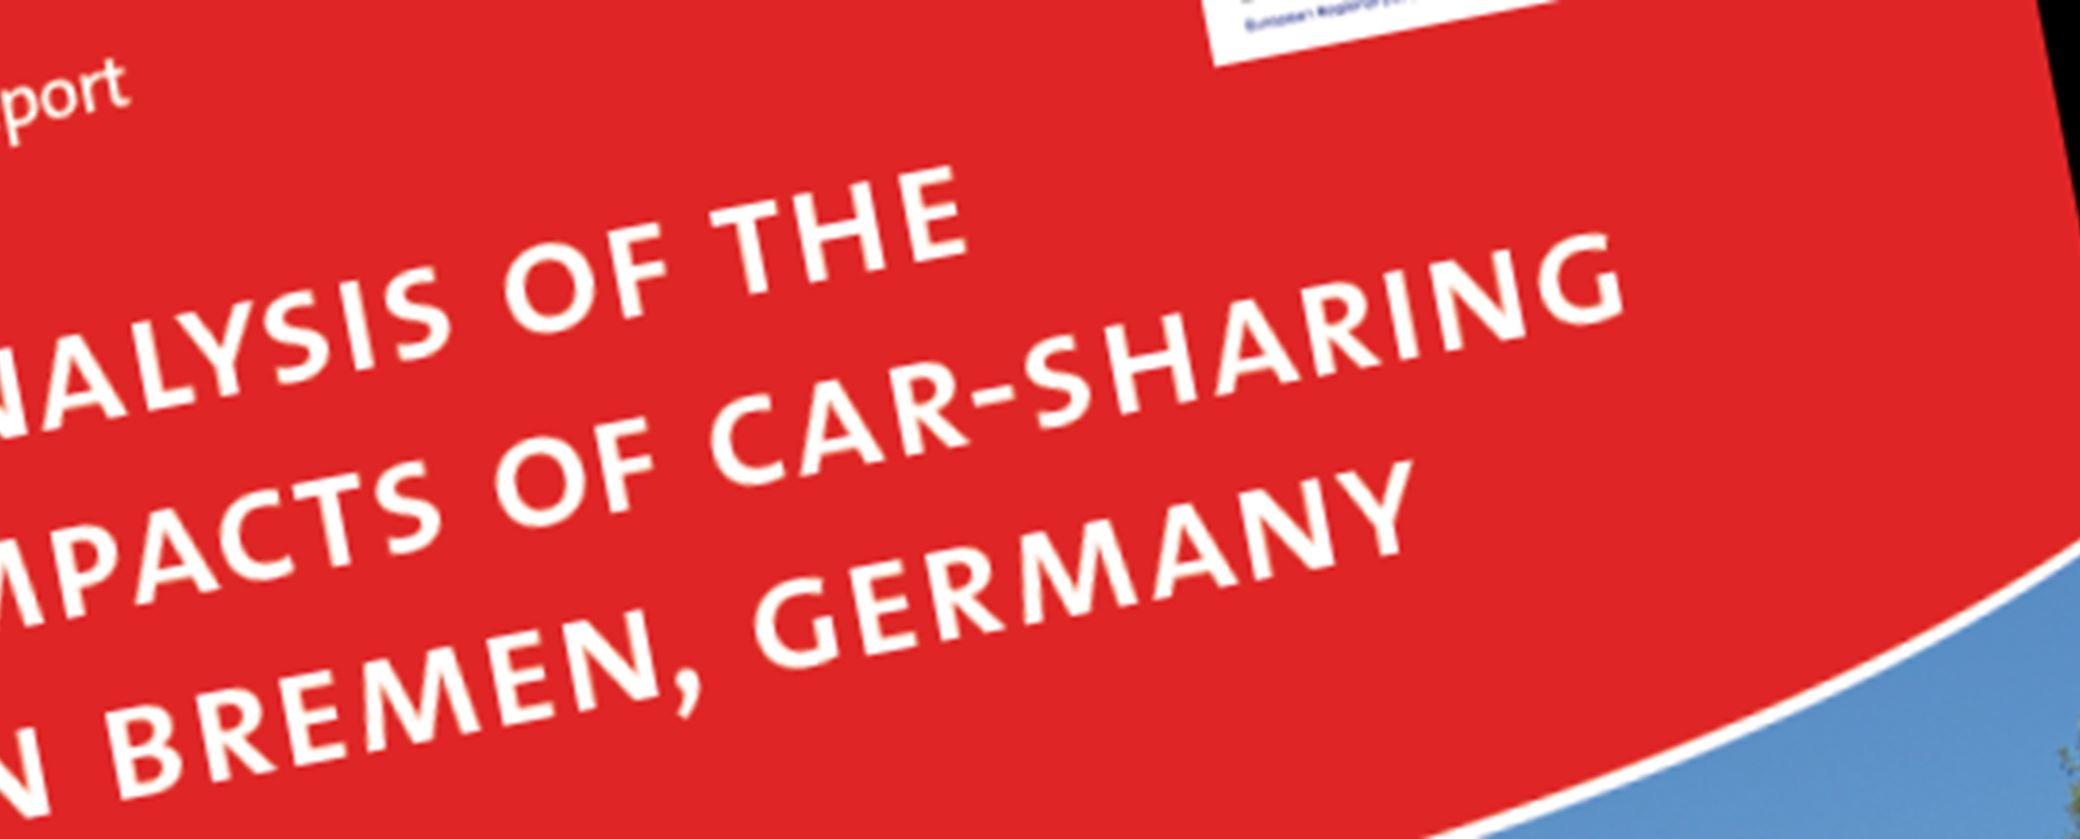 Impact Analysis of Car-Sharing in Bremen - English report